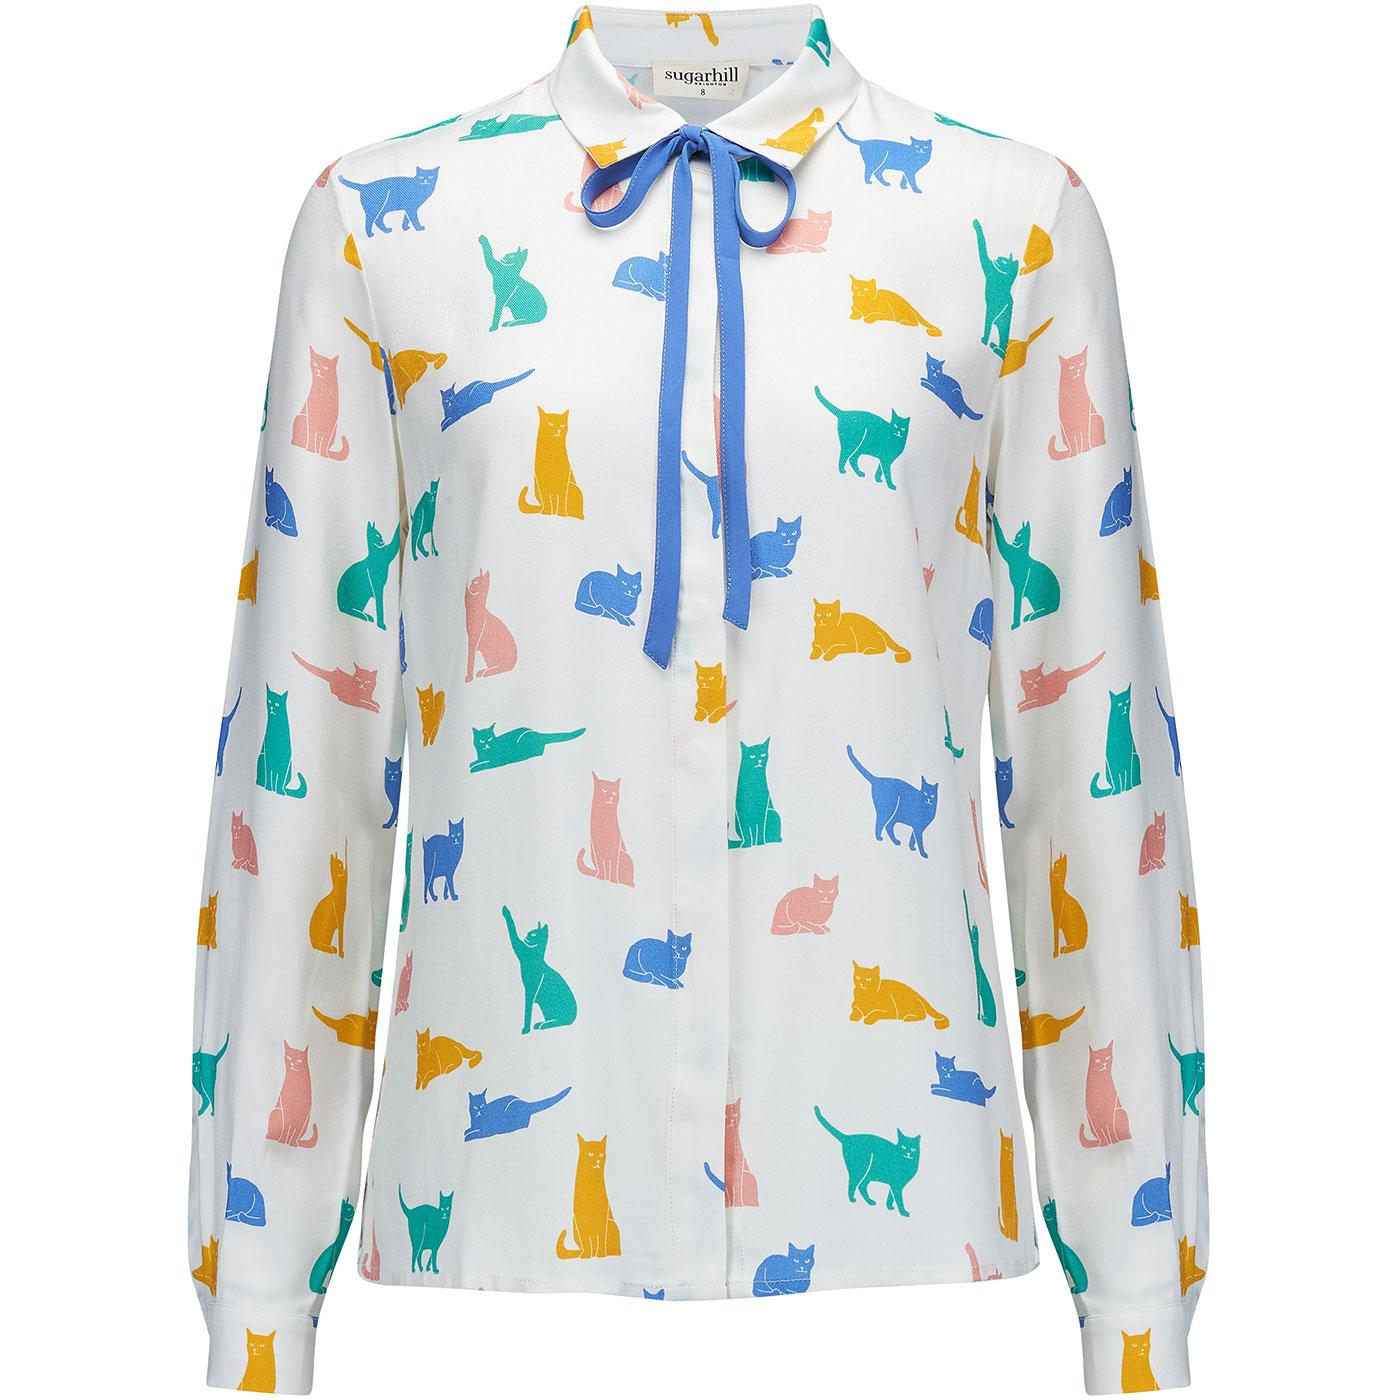 Catrina SUGARHILL BRIGHTON Purrfect Cats Shirt